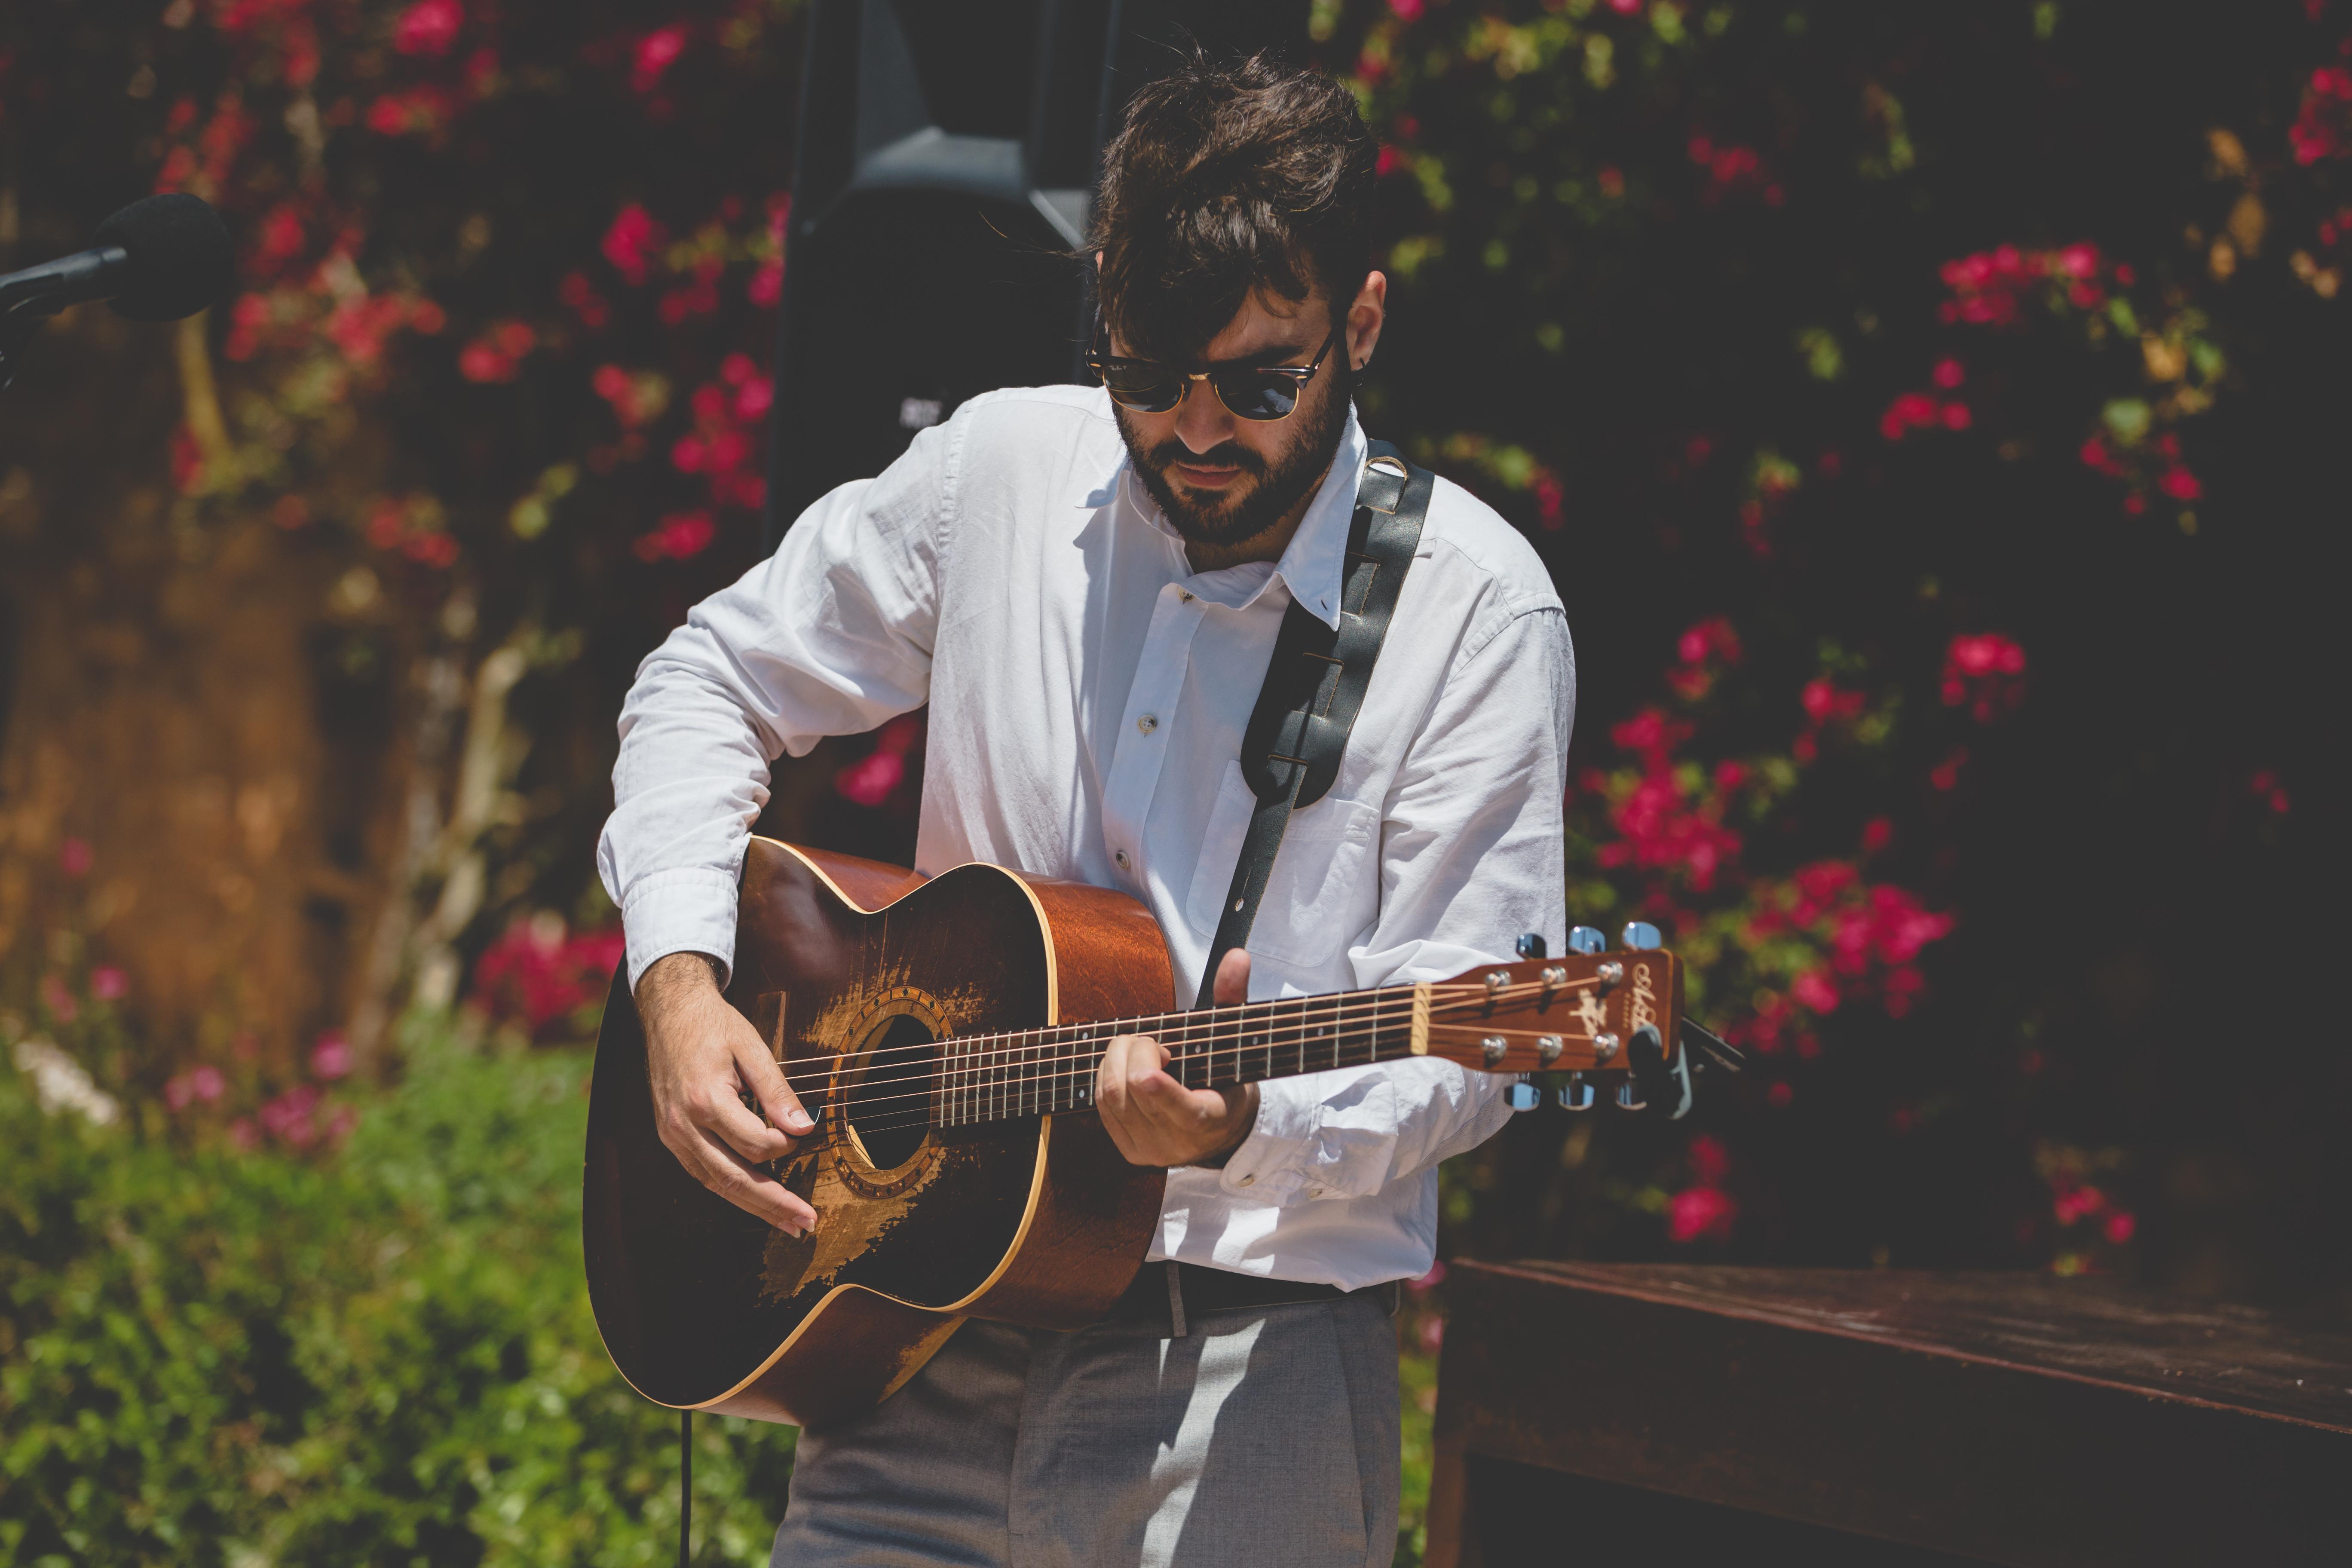 Jaunjo, the wedding guitarist